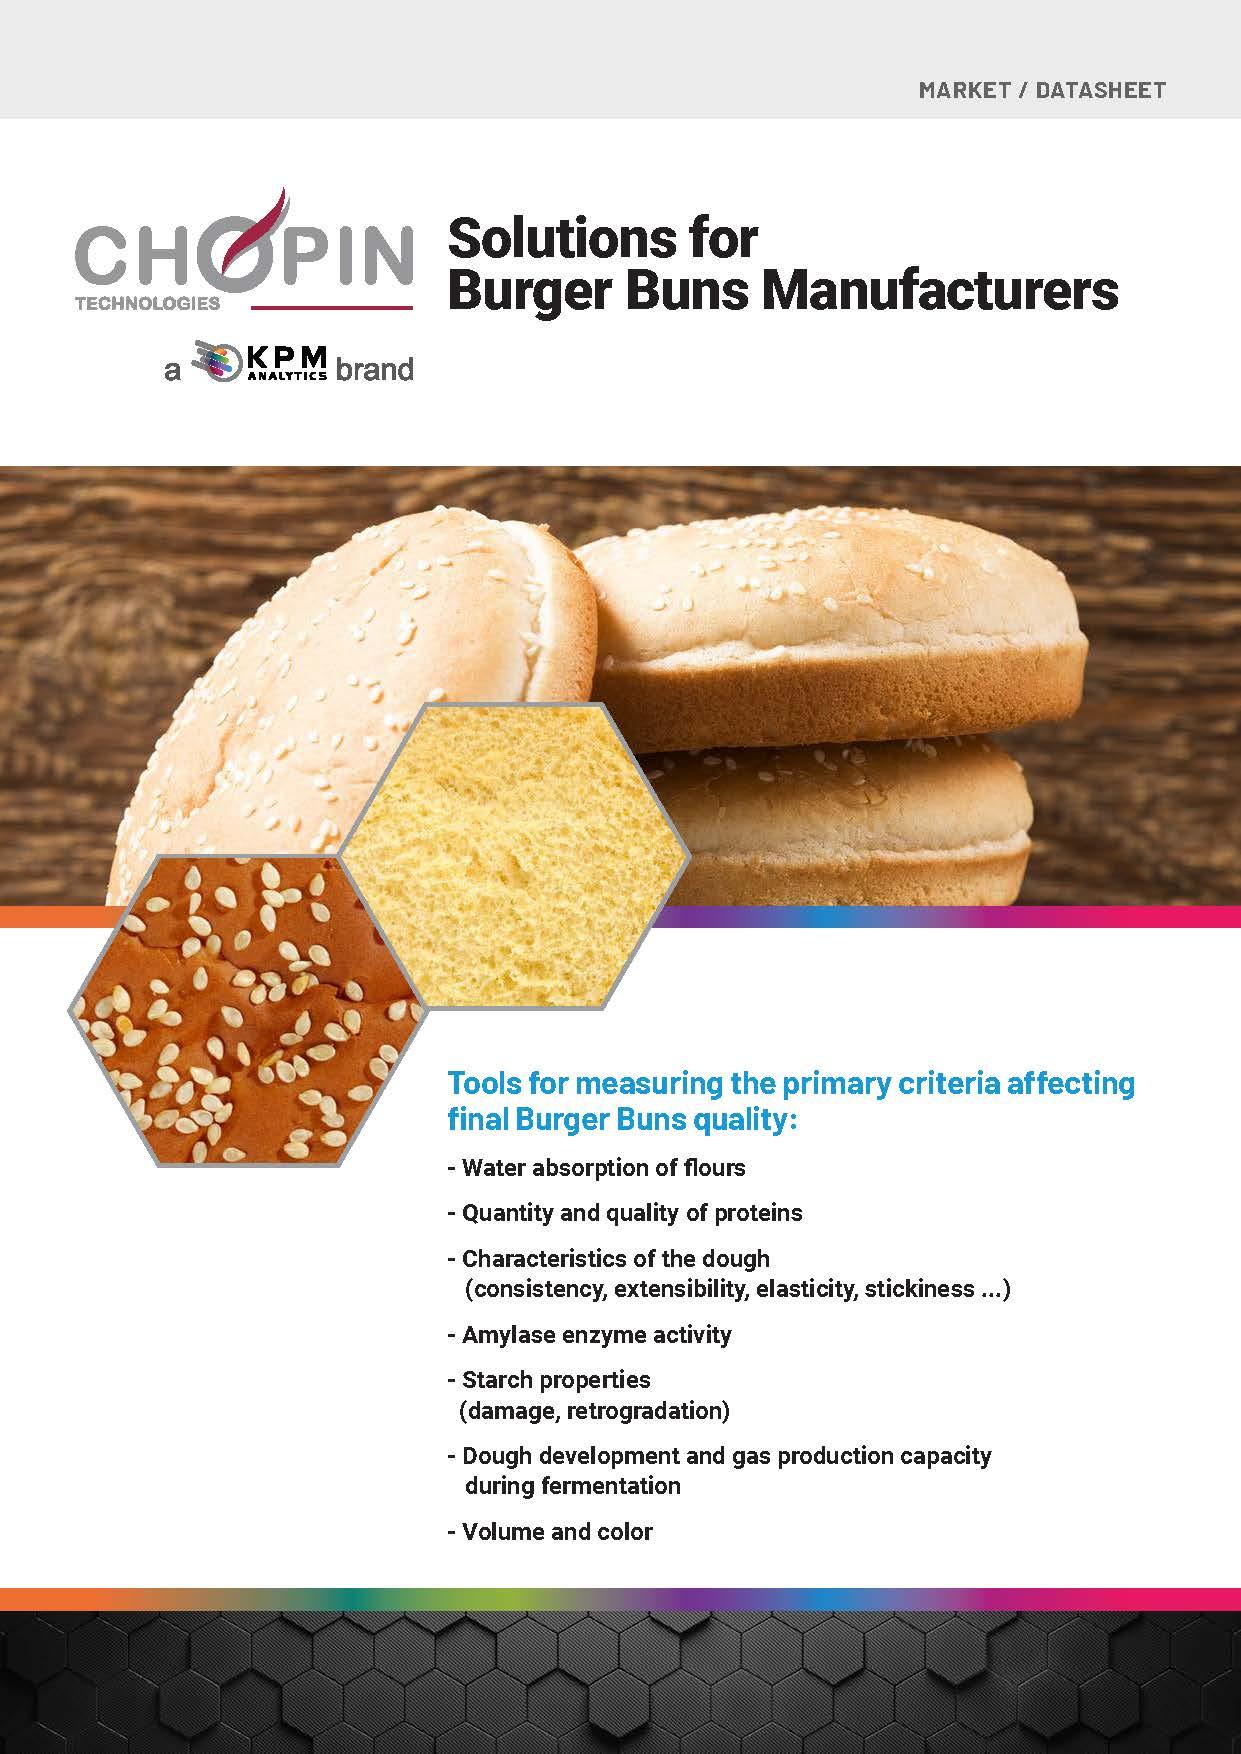 Solutions for Burger Bun Manufacturers